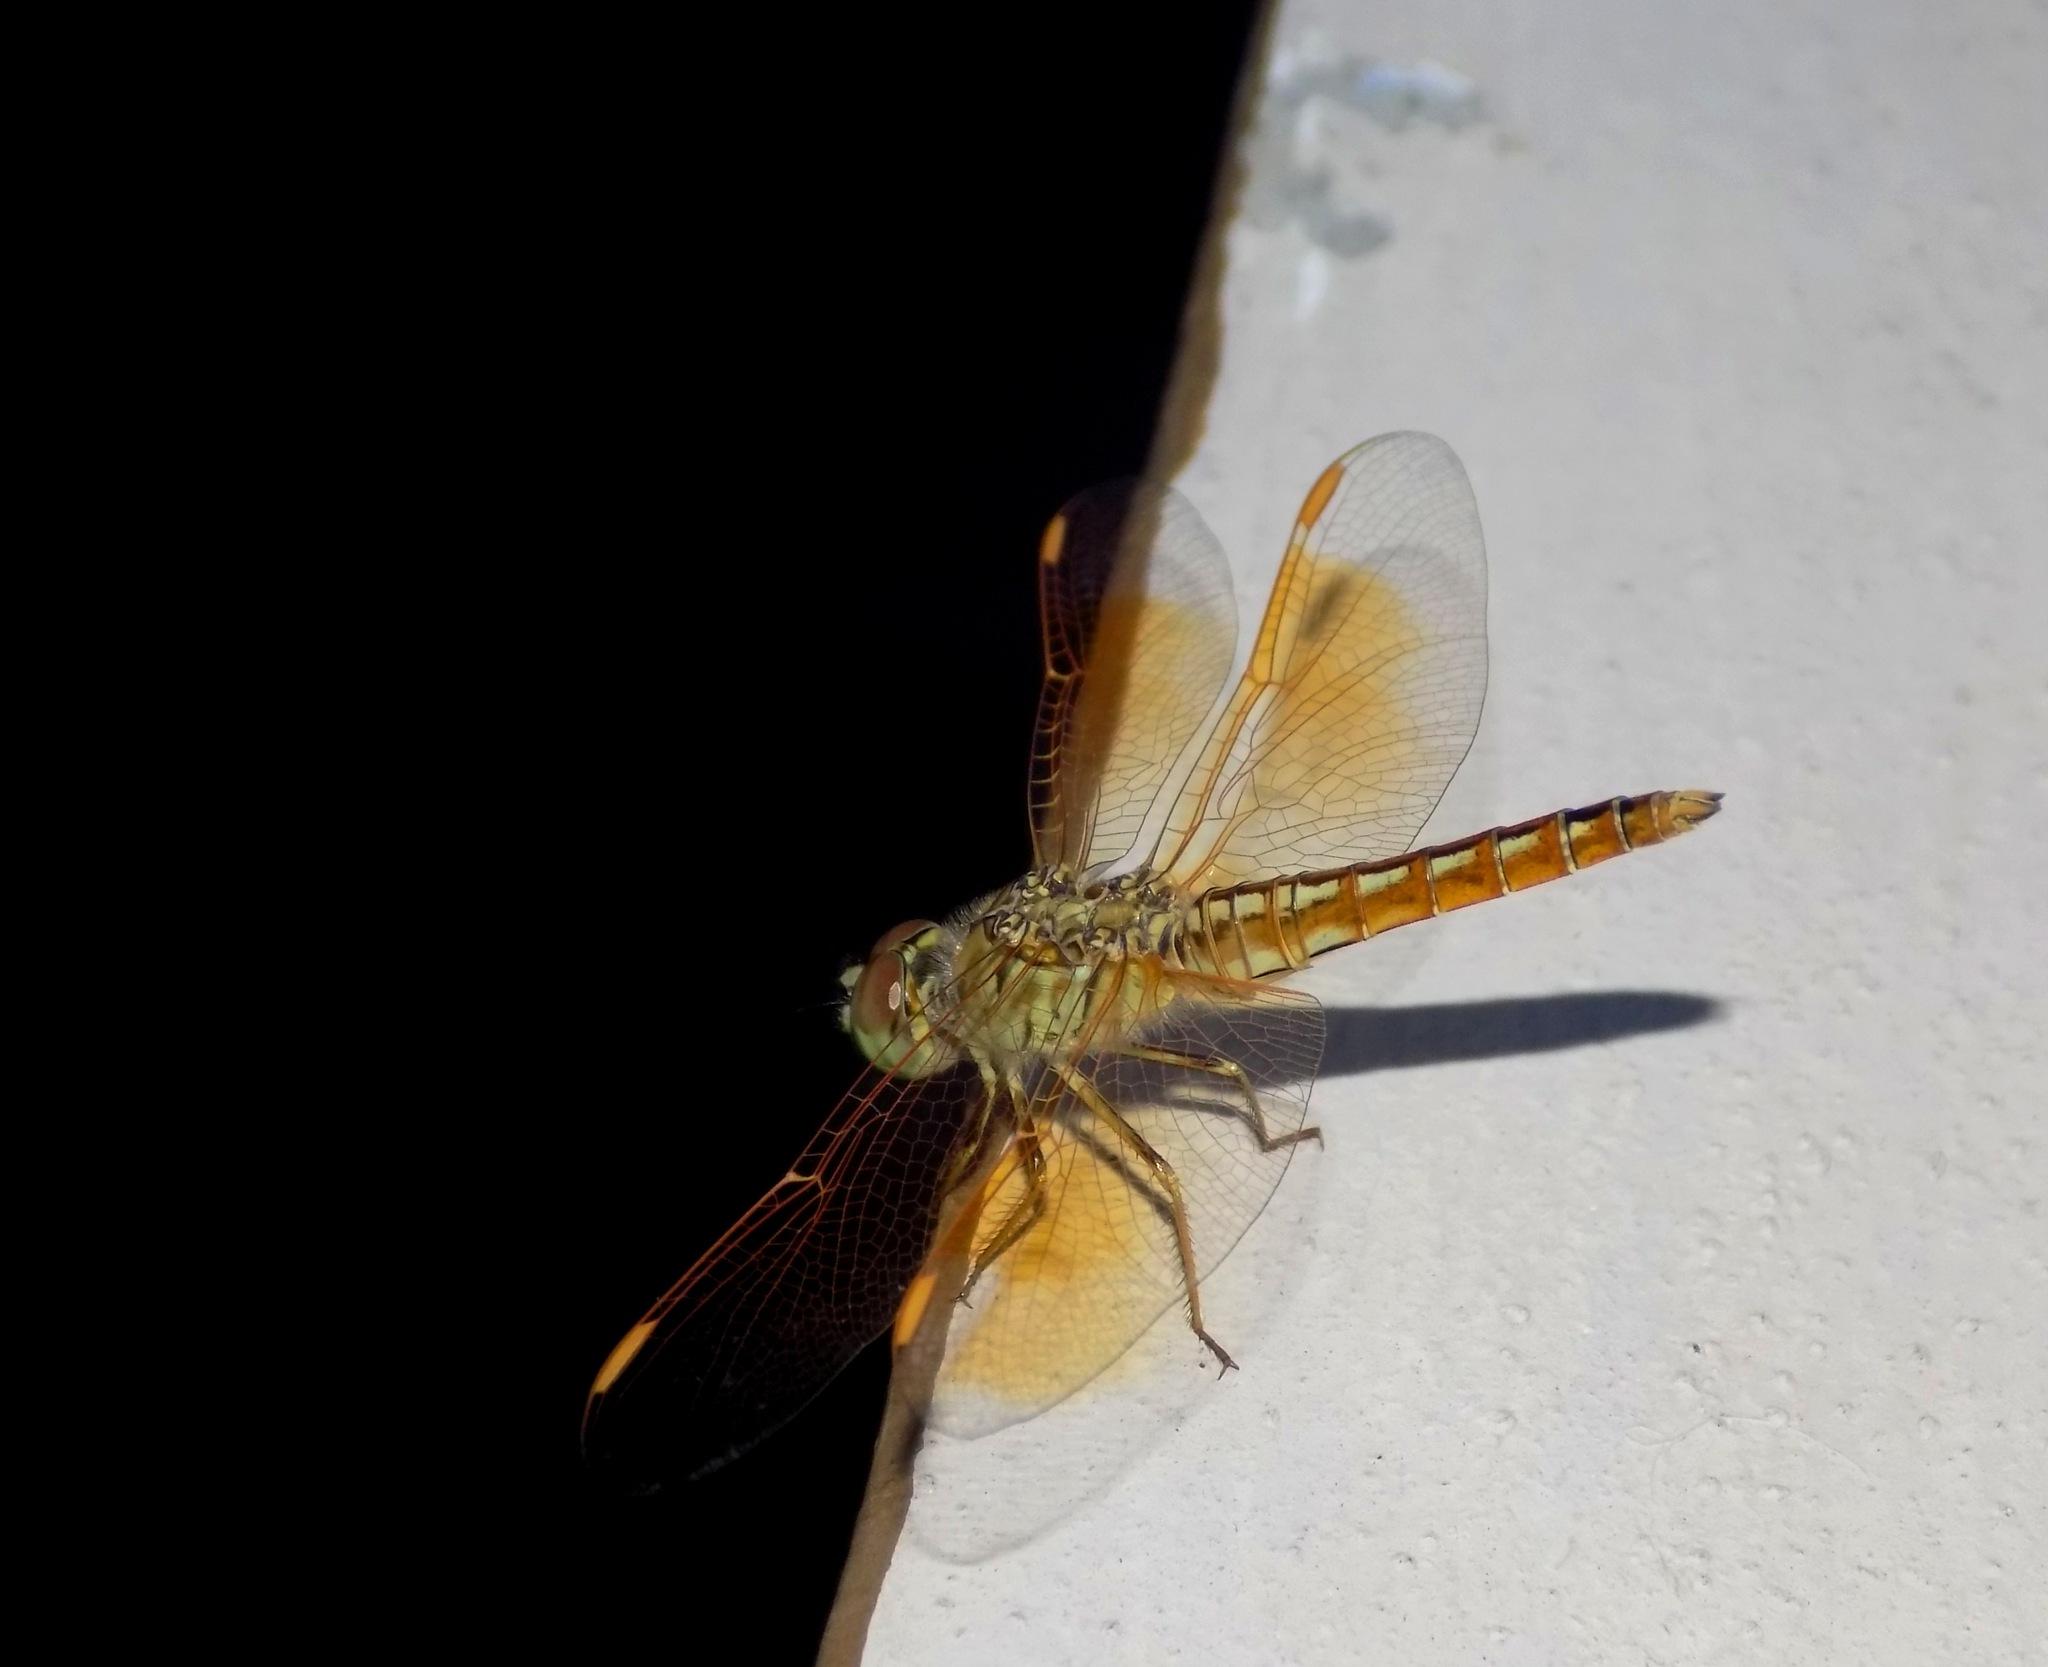 Dragonfly by Chandramoulieswar